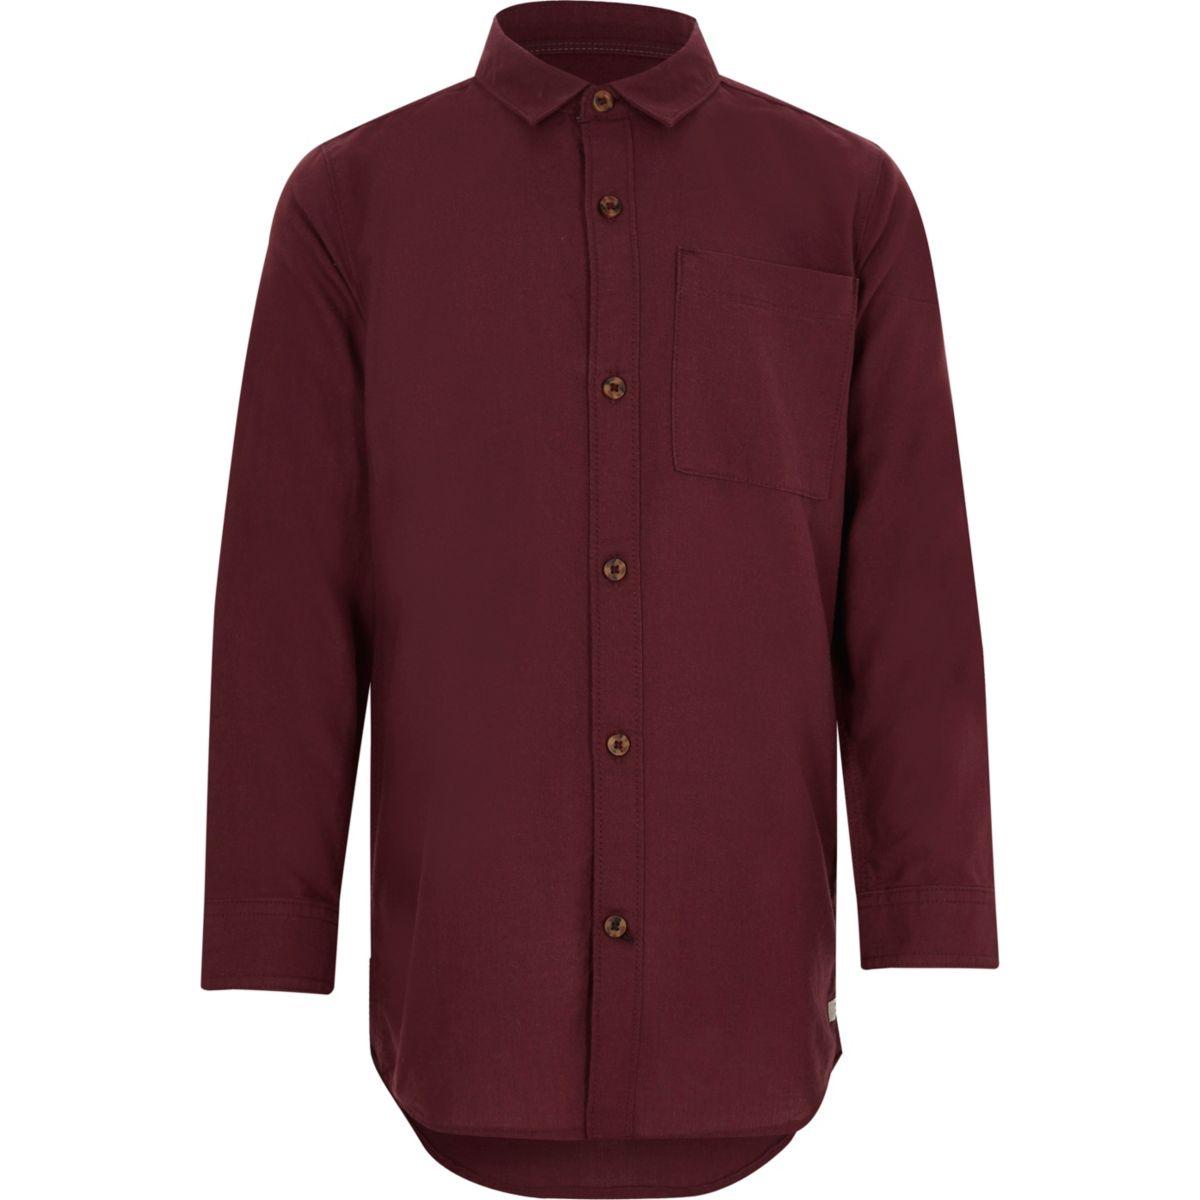 Boys burgundy long sleeve Oxford shirt